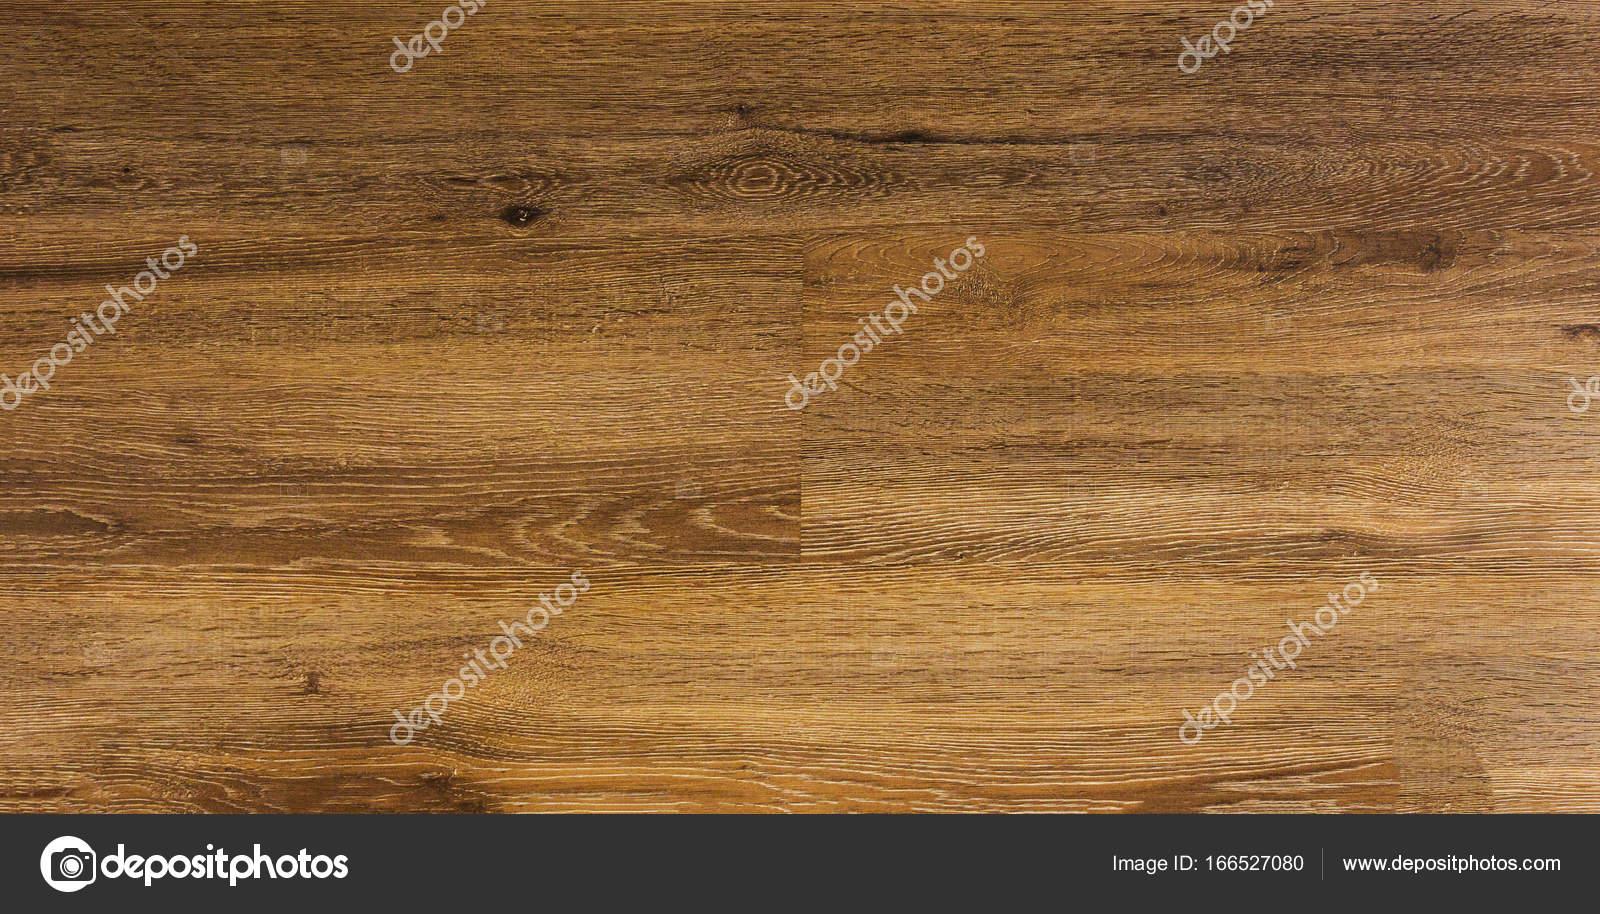 Fußbodenbelag Eiche ~ Vinyl fußboden eiche stockholm laminat click bodenbelag diele in